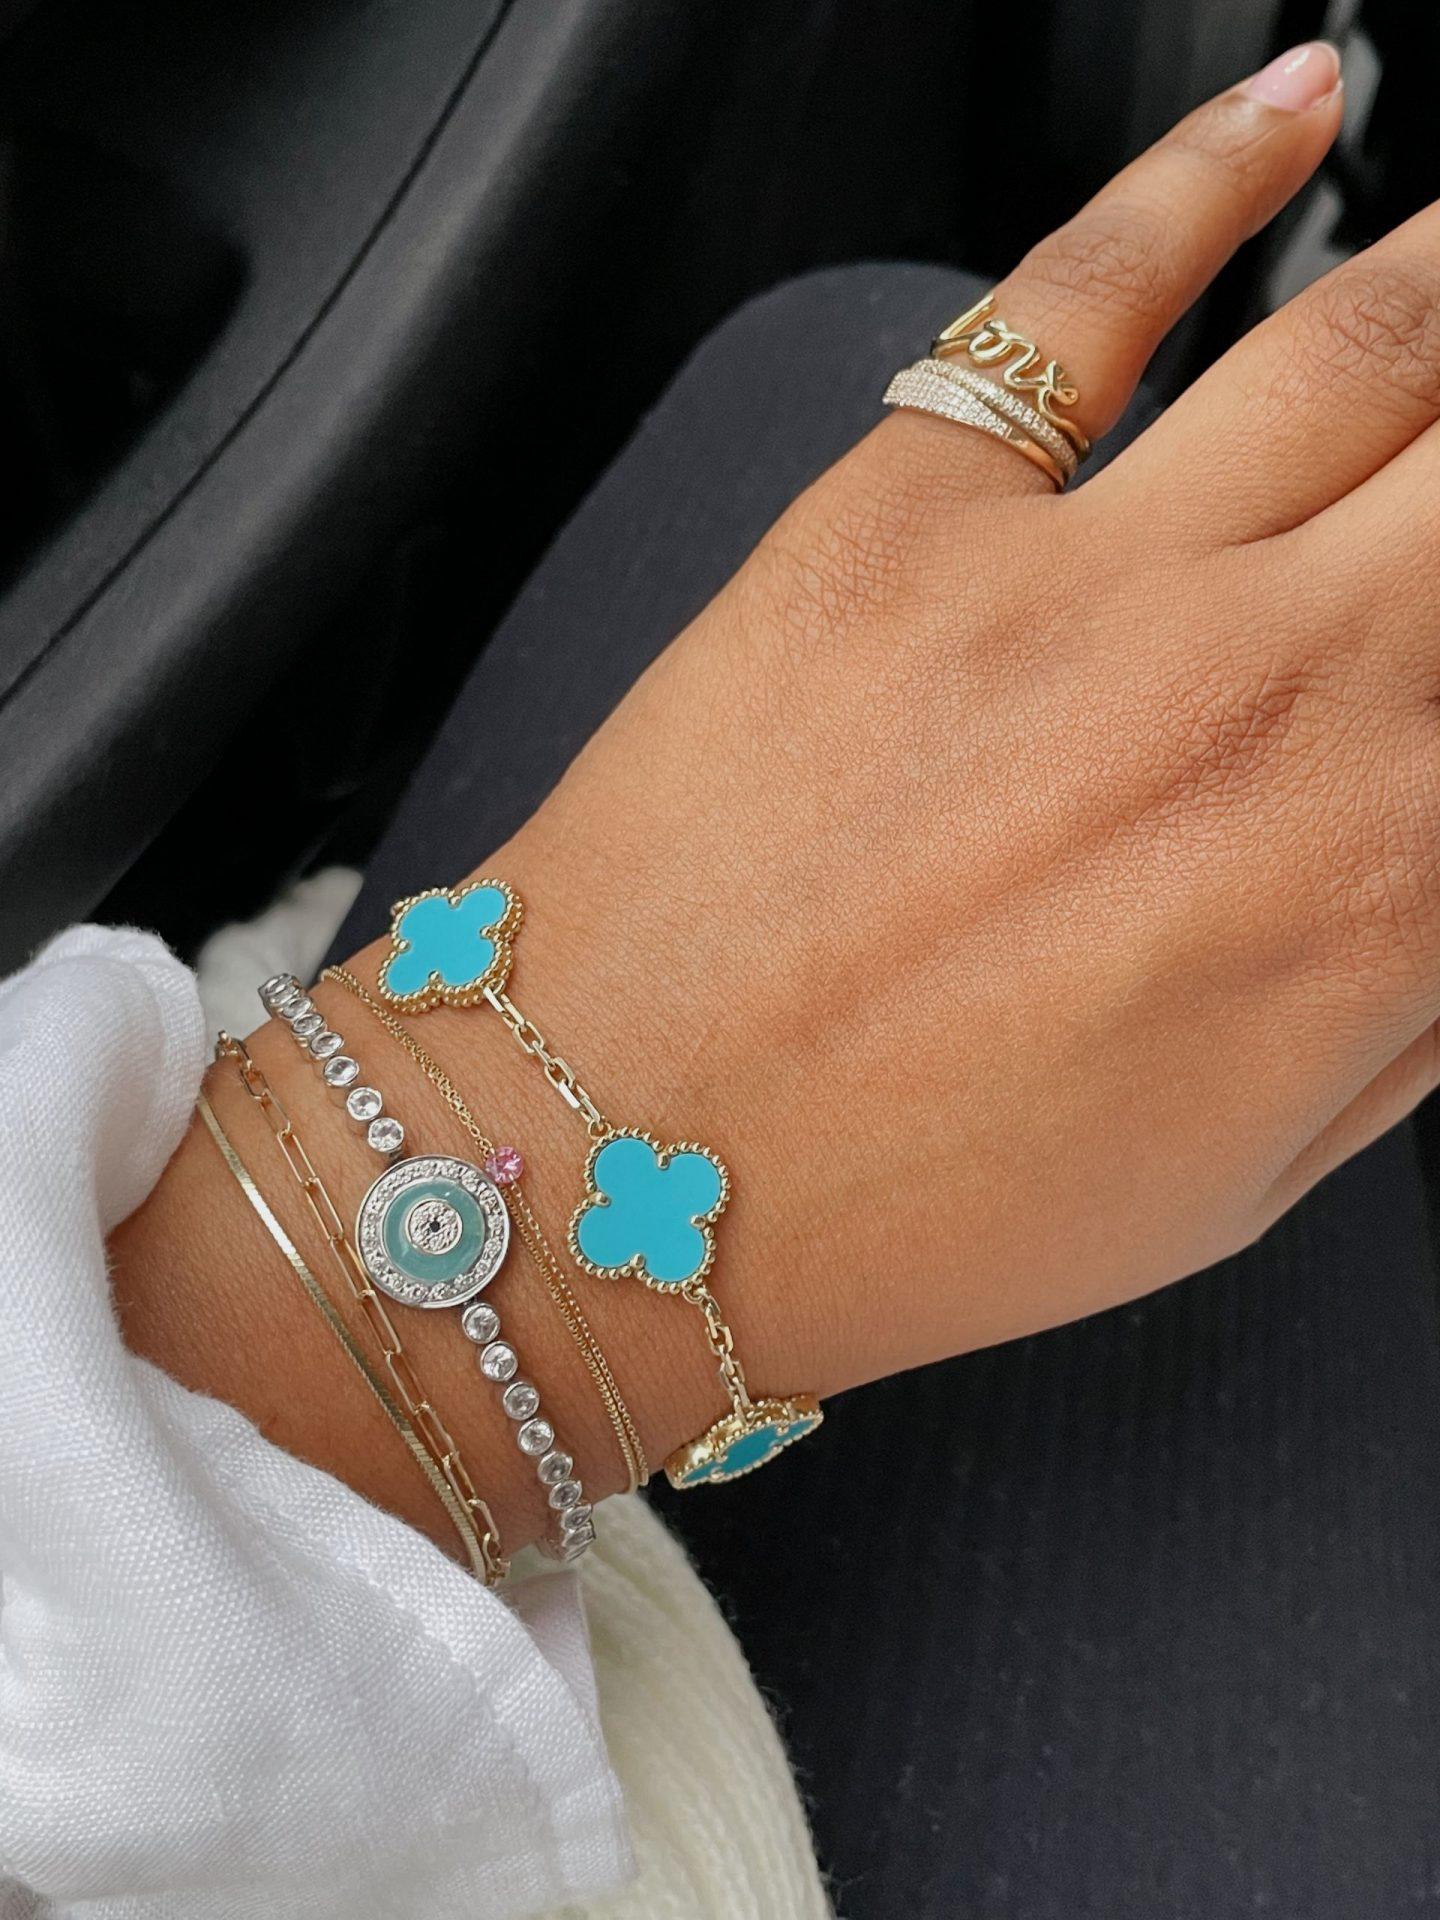 Summer Jewellery That Sparks Joy